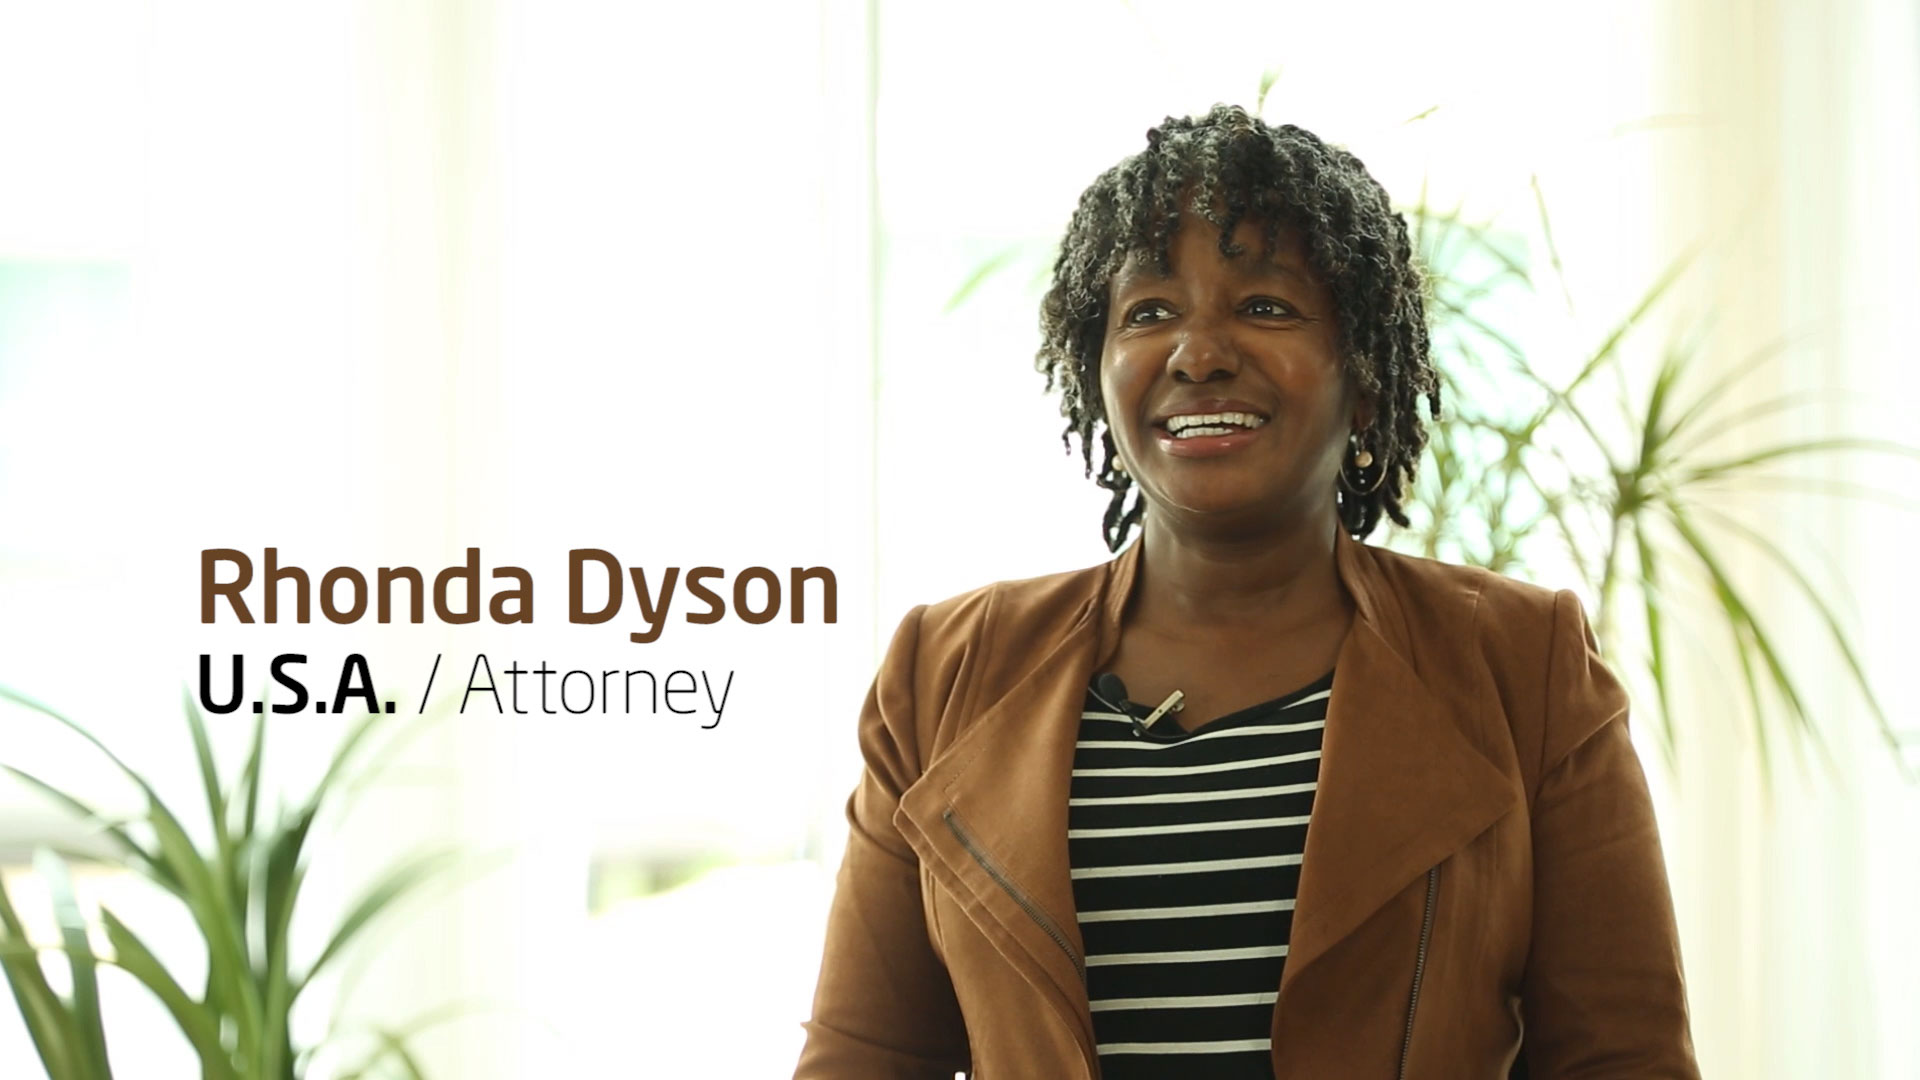 Rhonda Dyson